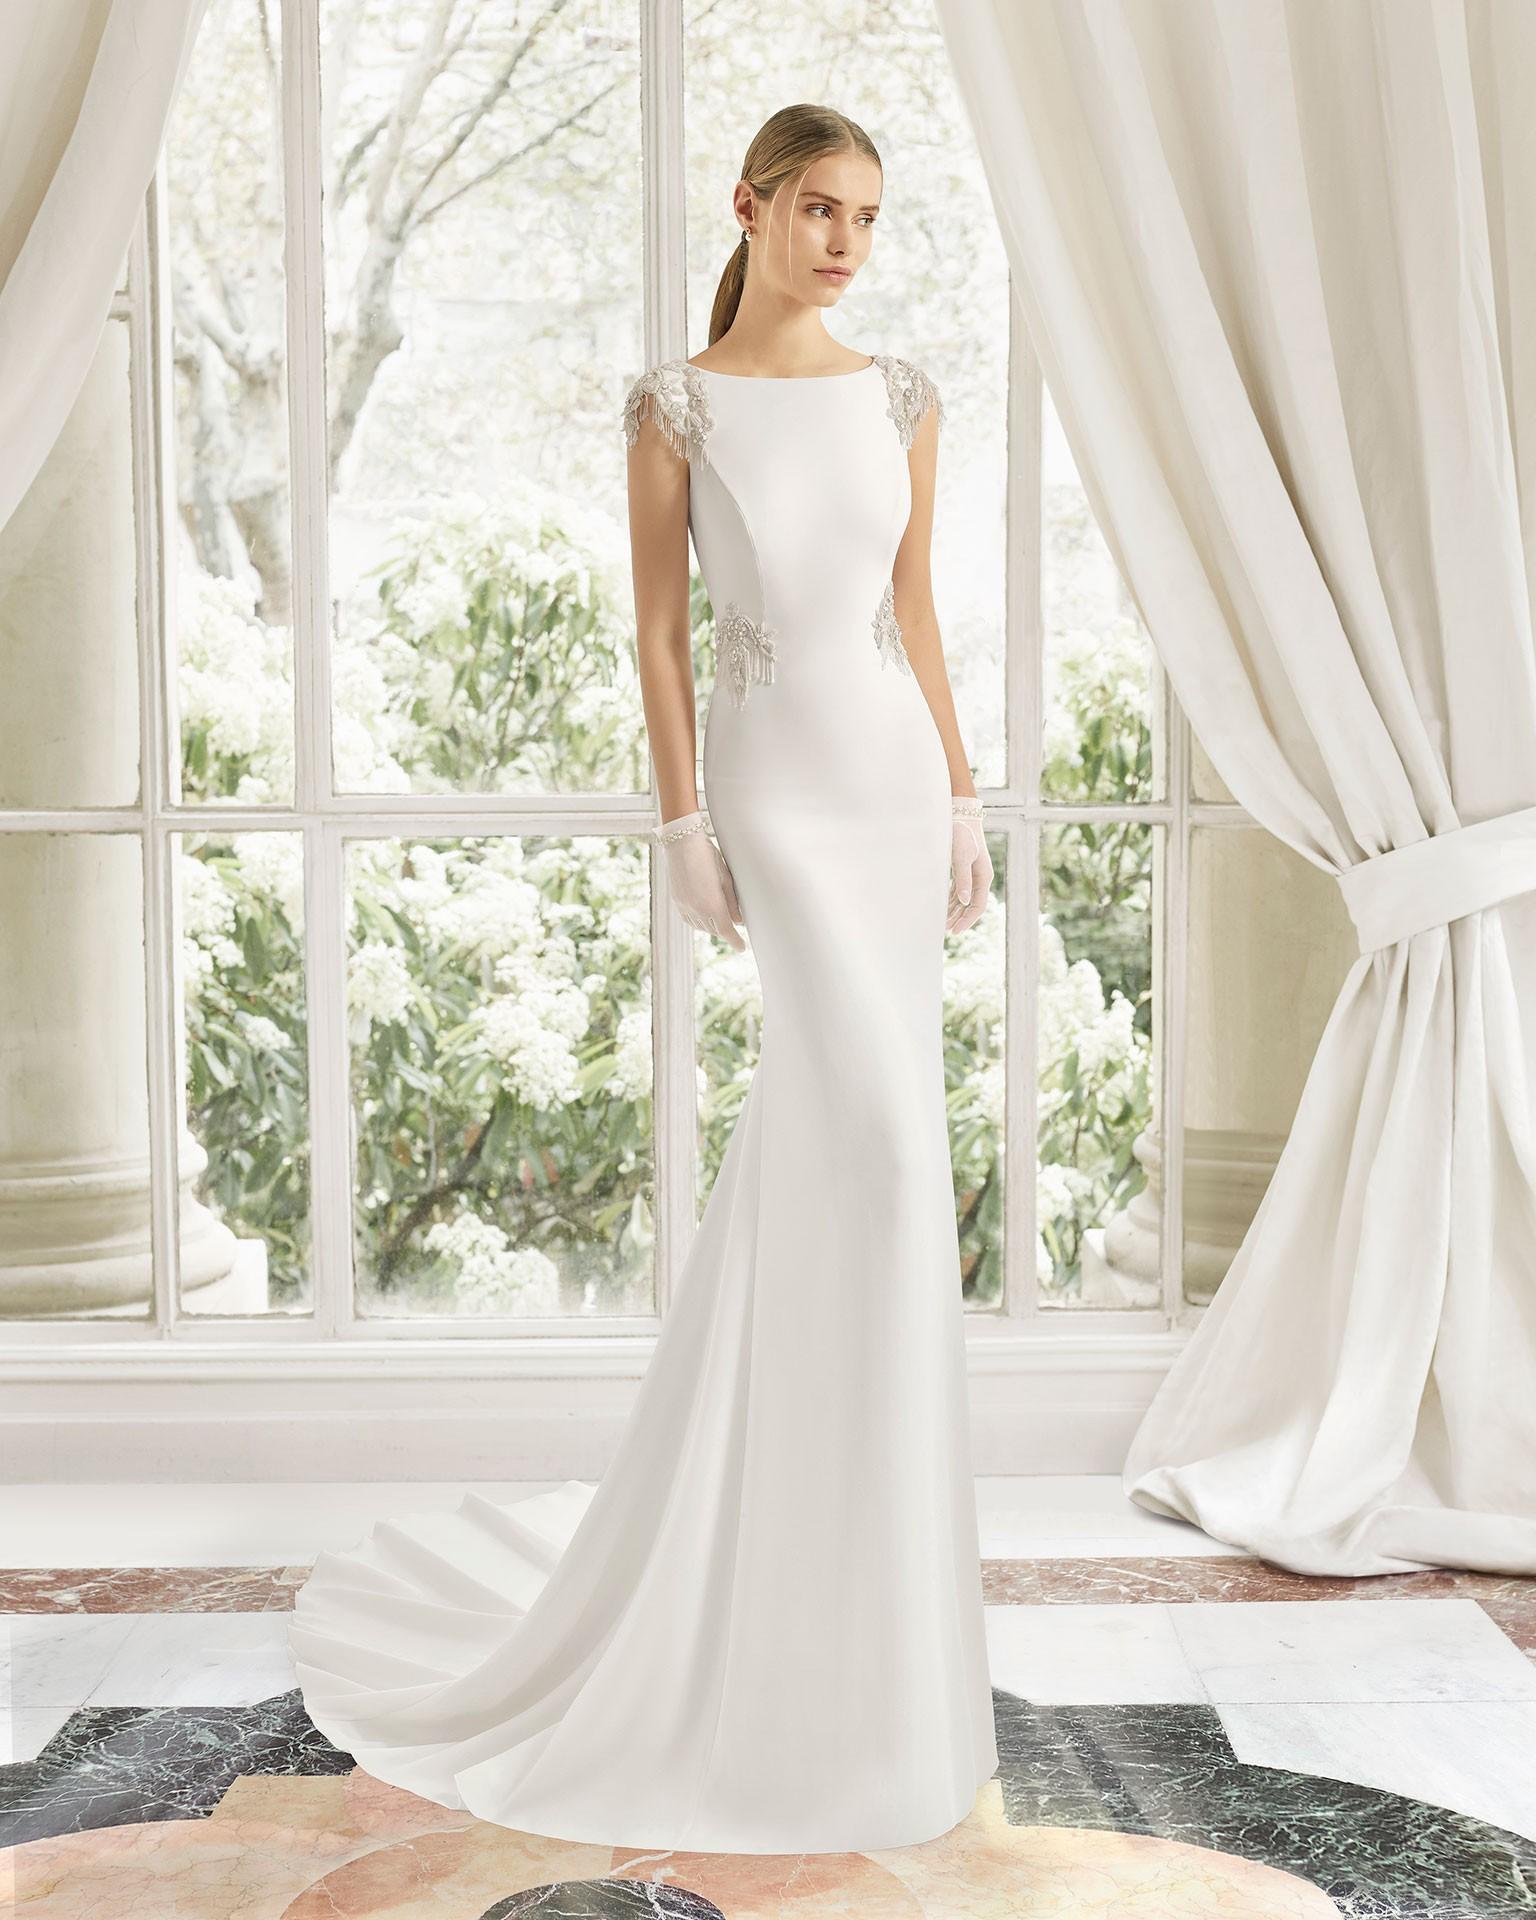 Rosa Clara Naipe Sample Wedding Dress On Sale 80% Off